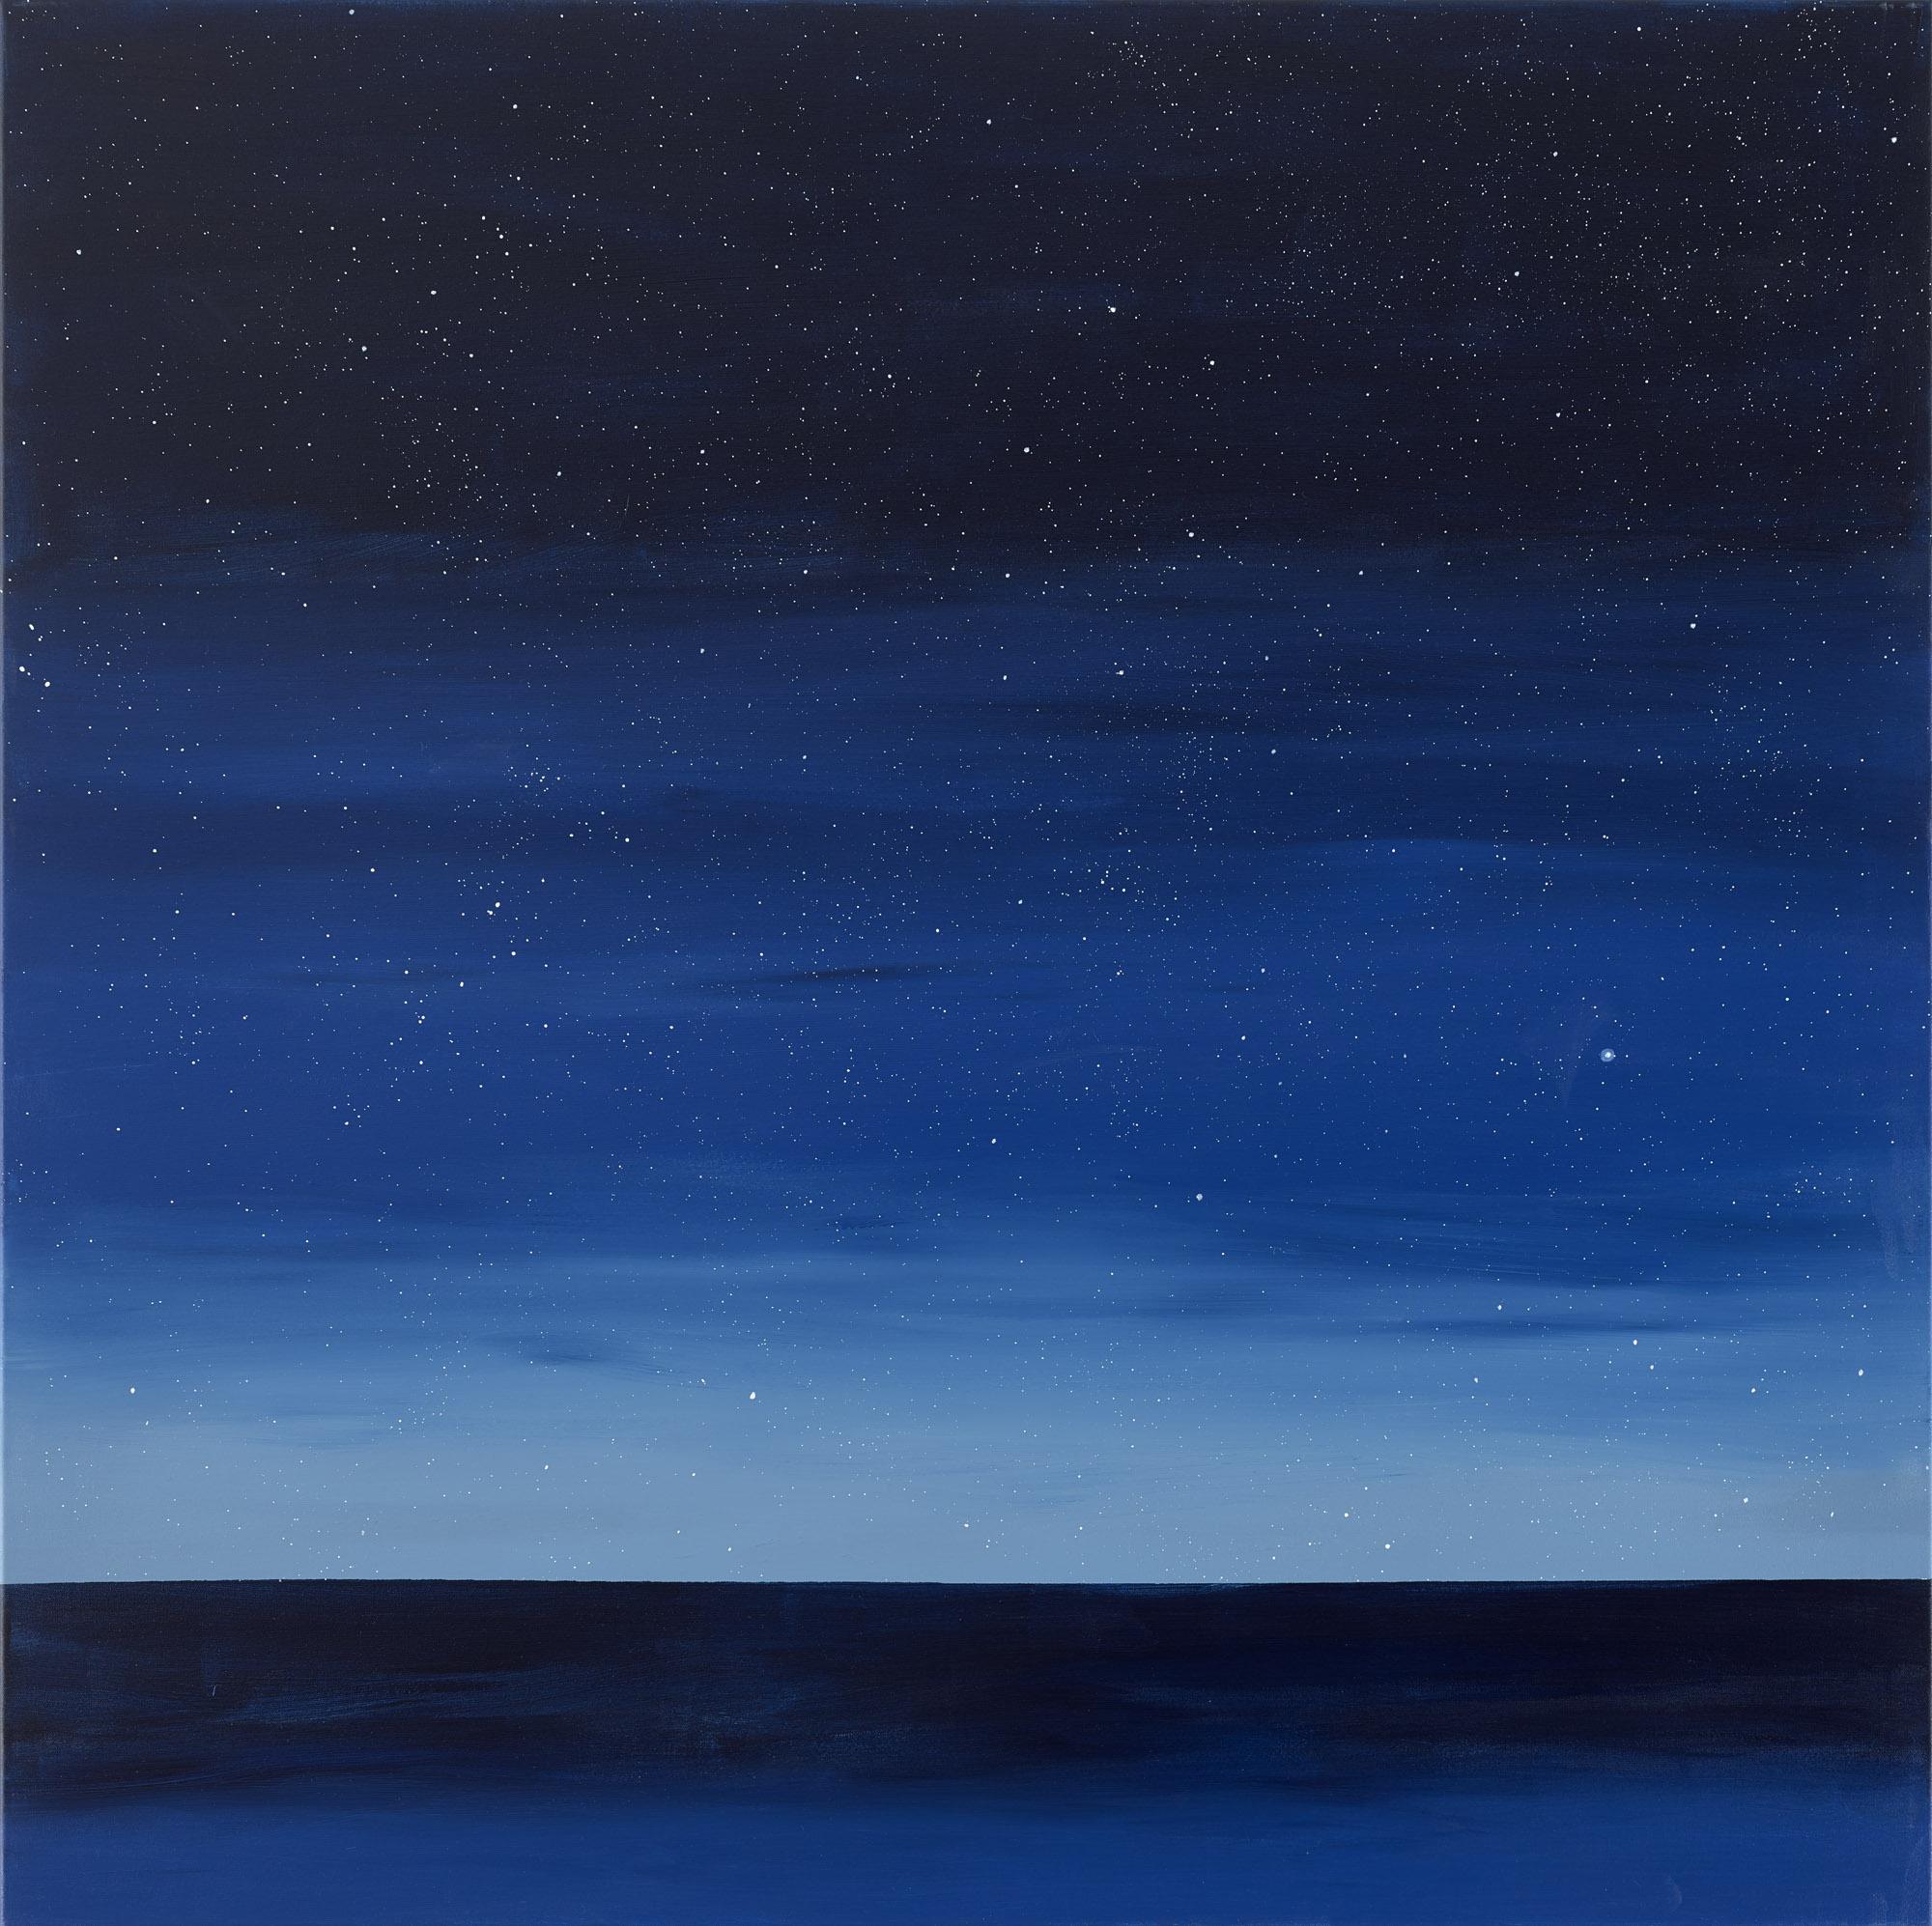 Chemical Night 21:58, 2017, 110 x 110 cm